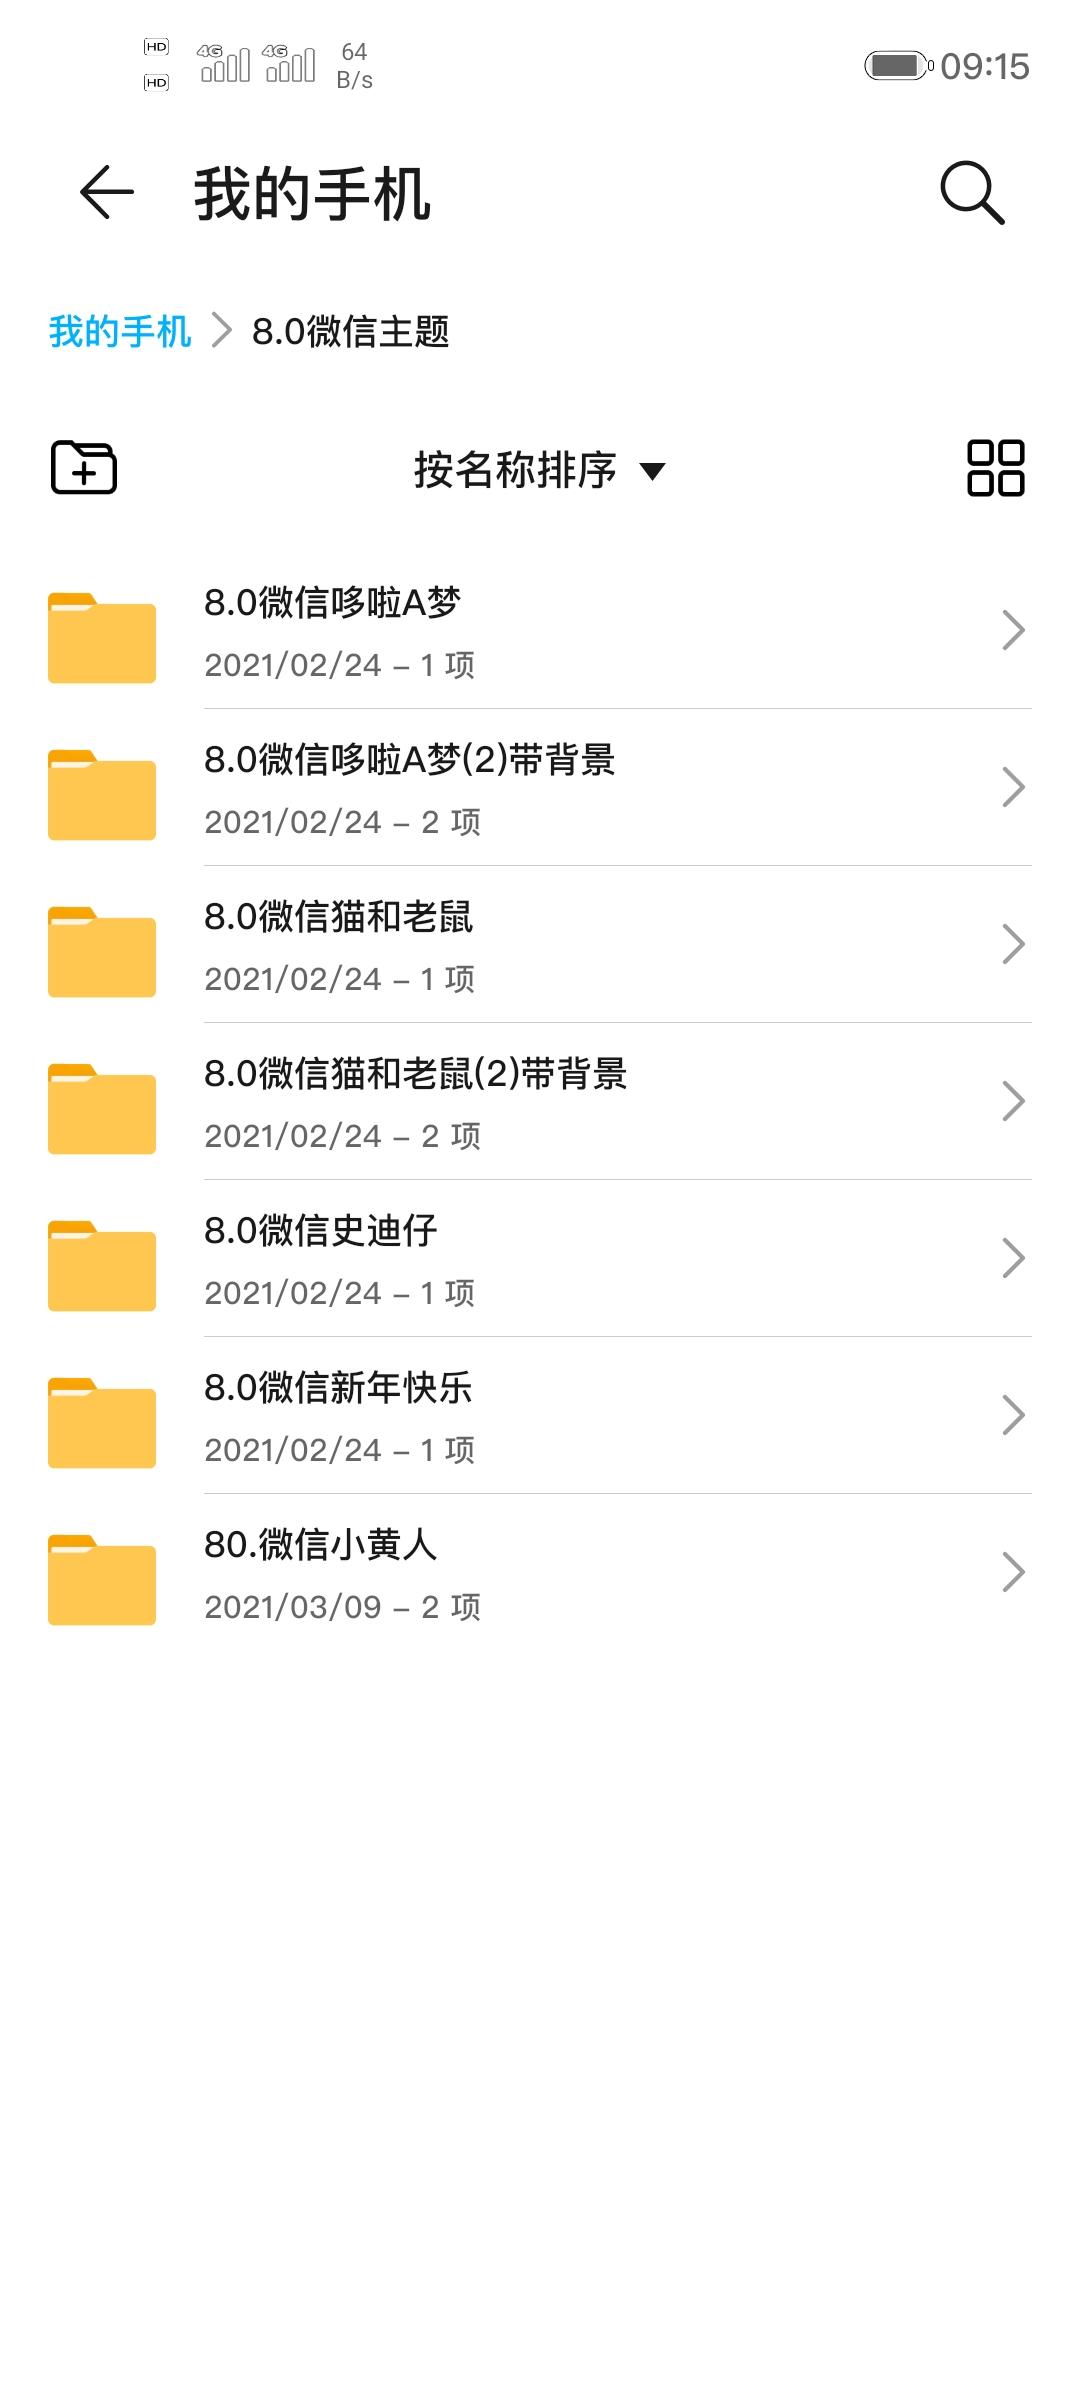 Screenshot_20210315_091507_com.huawei.hidisk.jpg